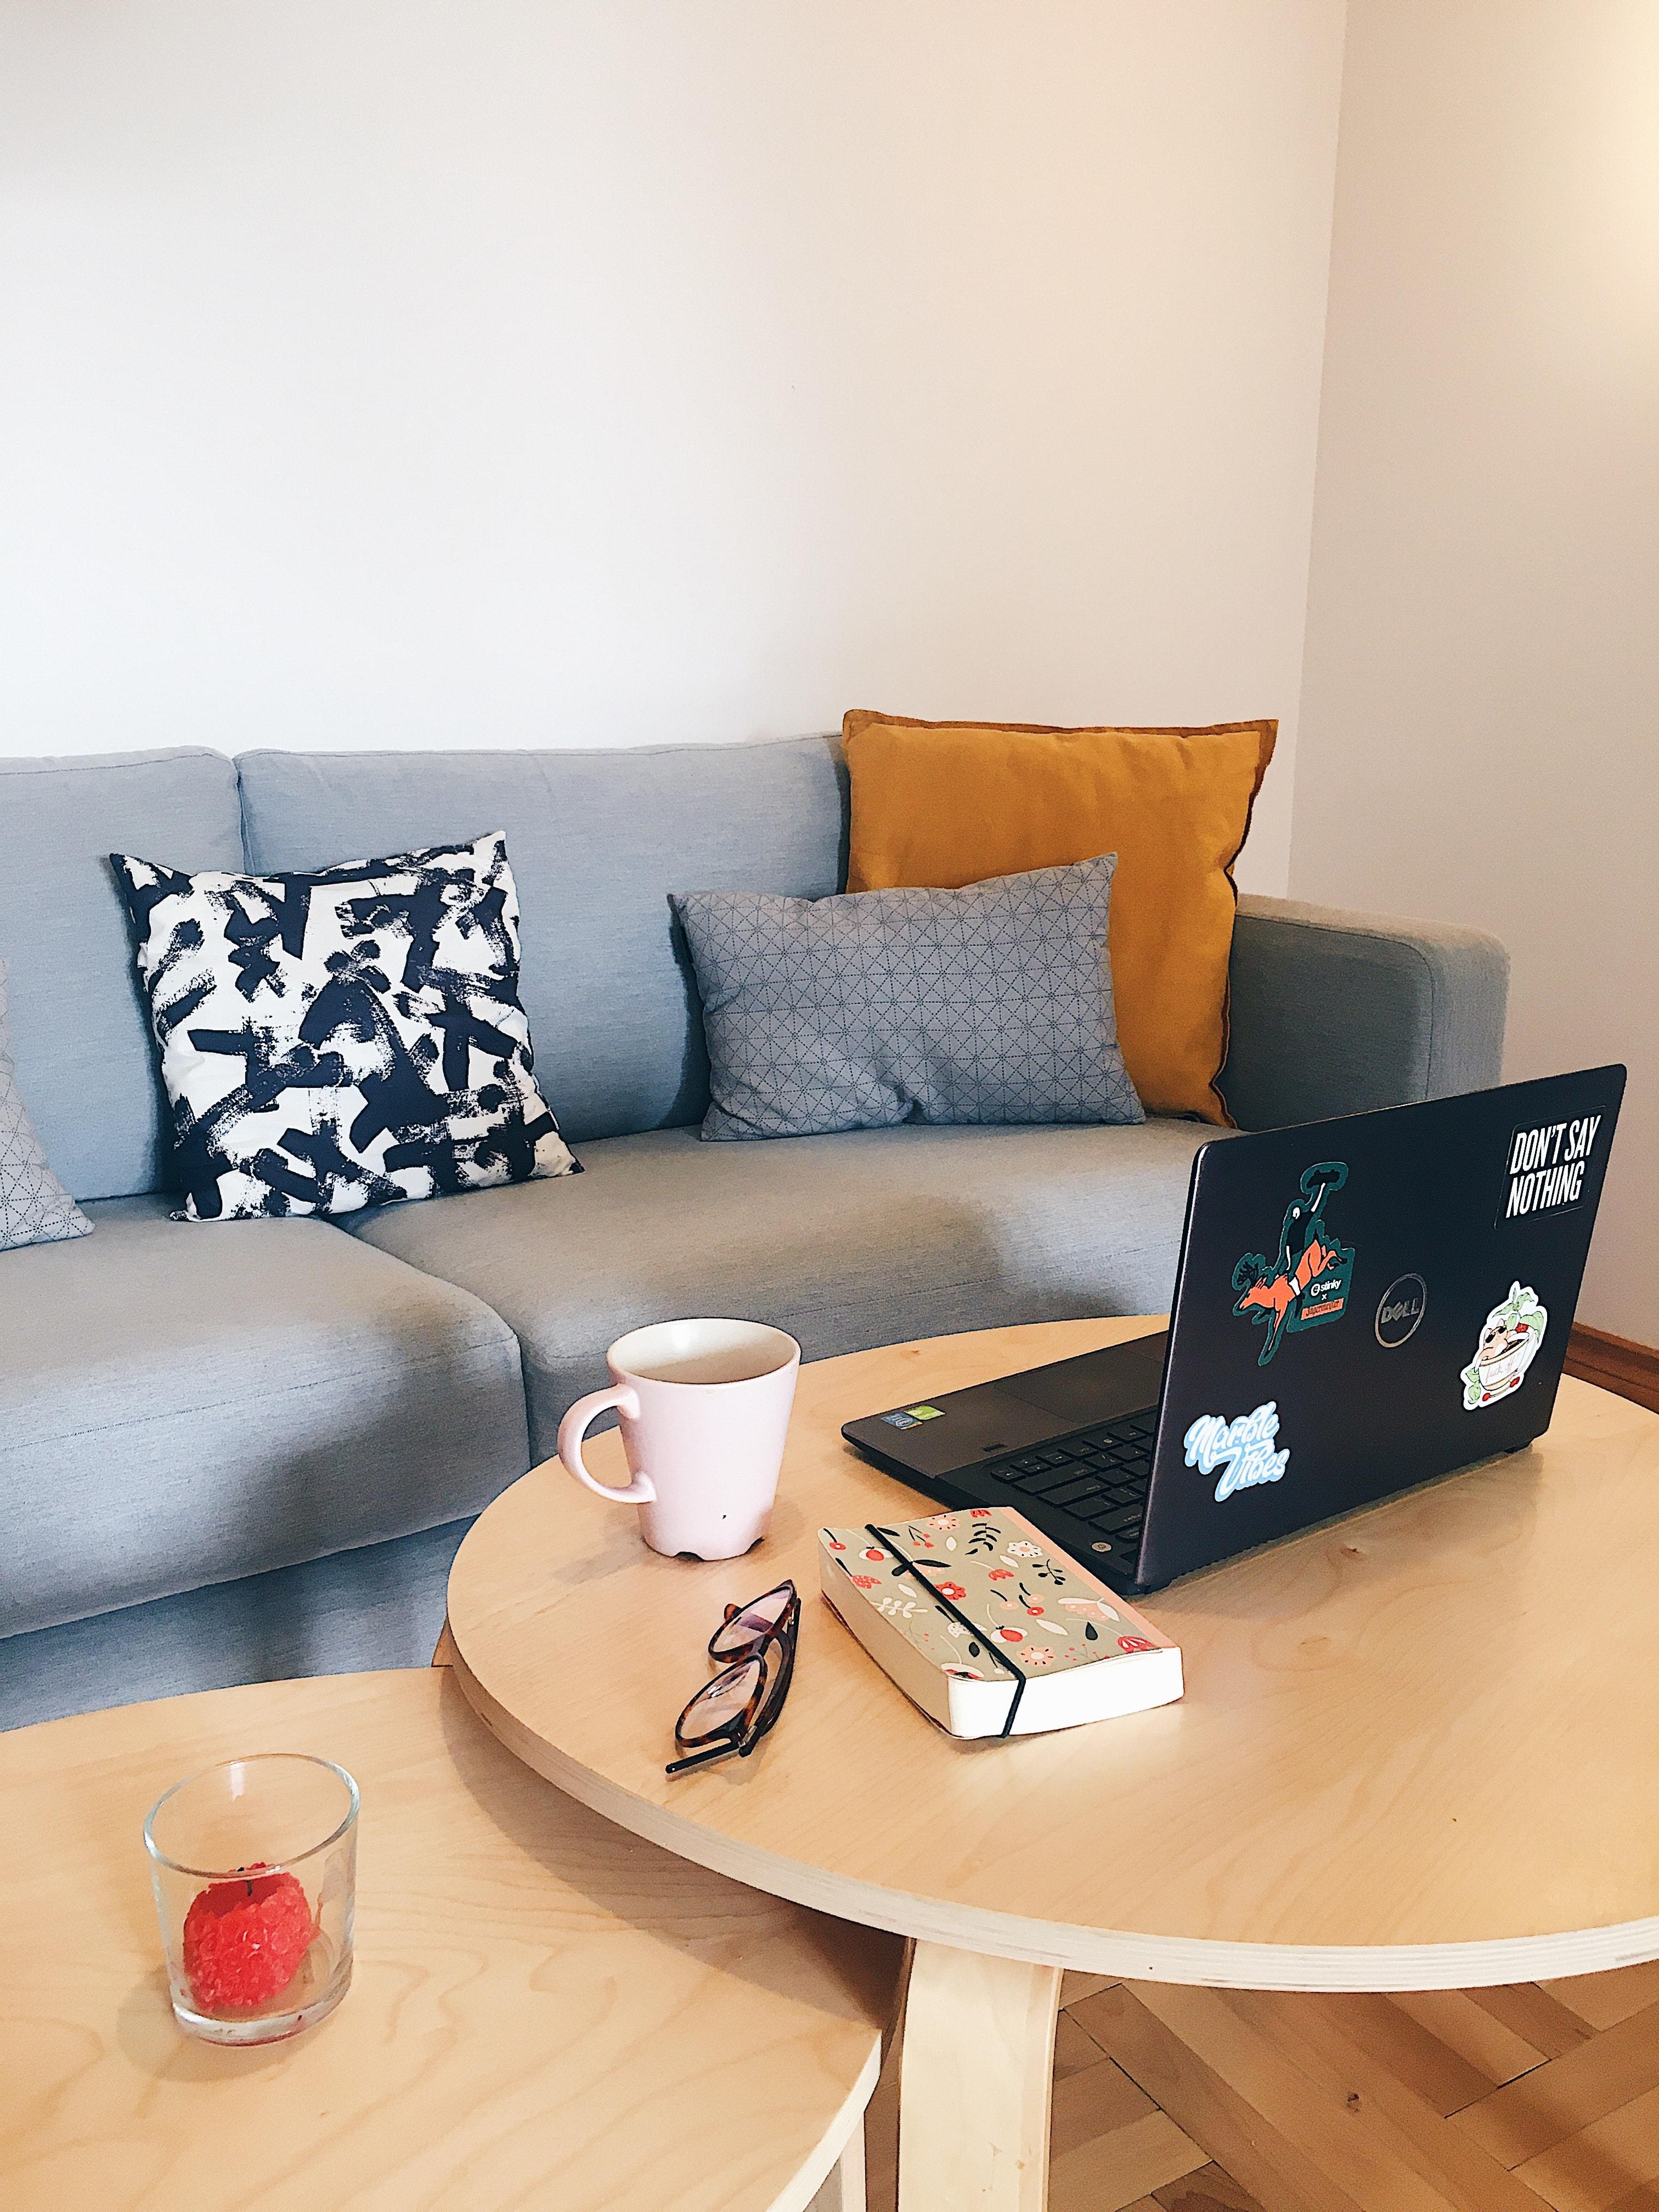 Doroteya's Home Workspace